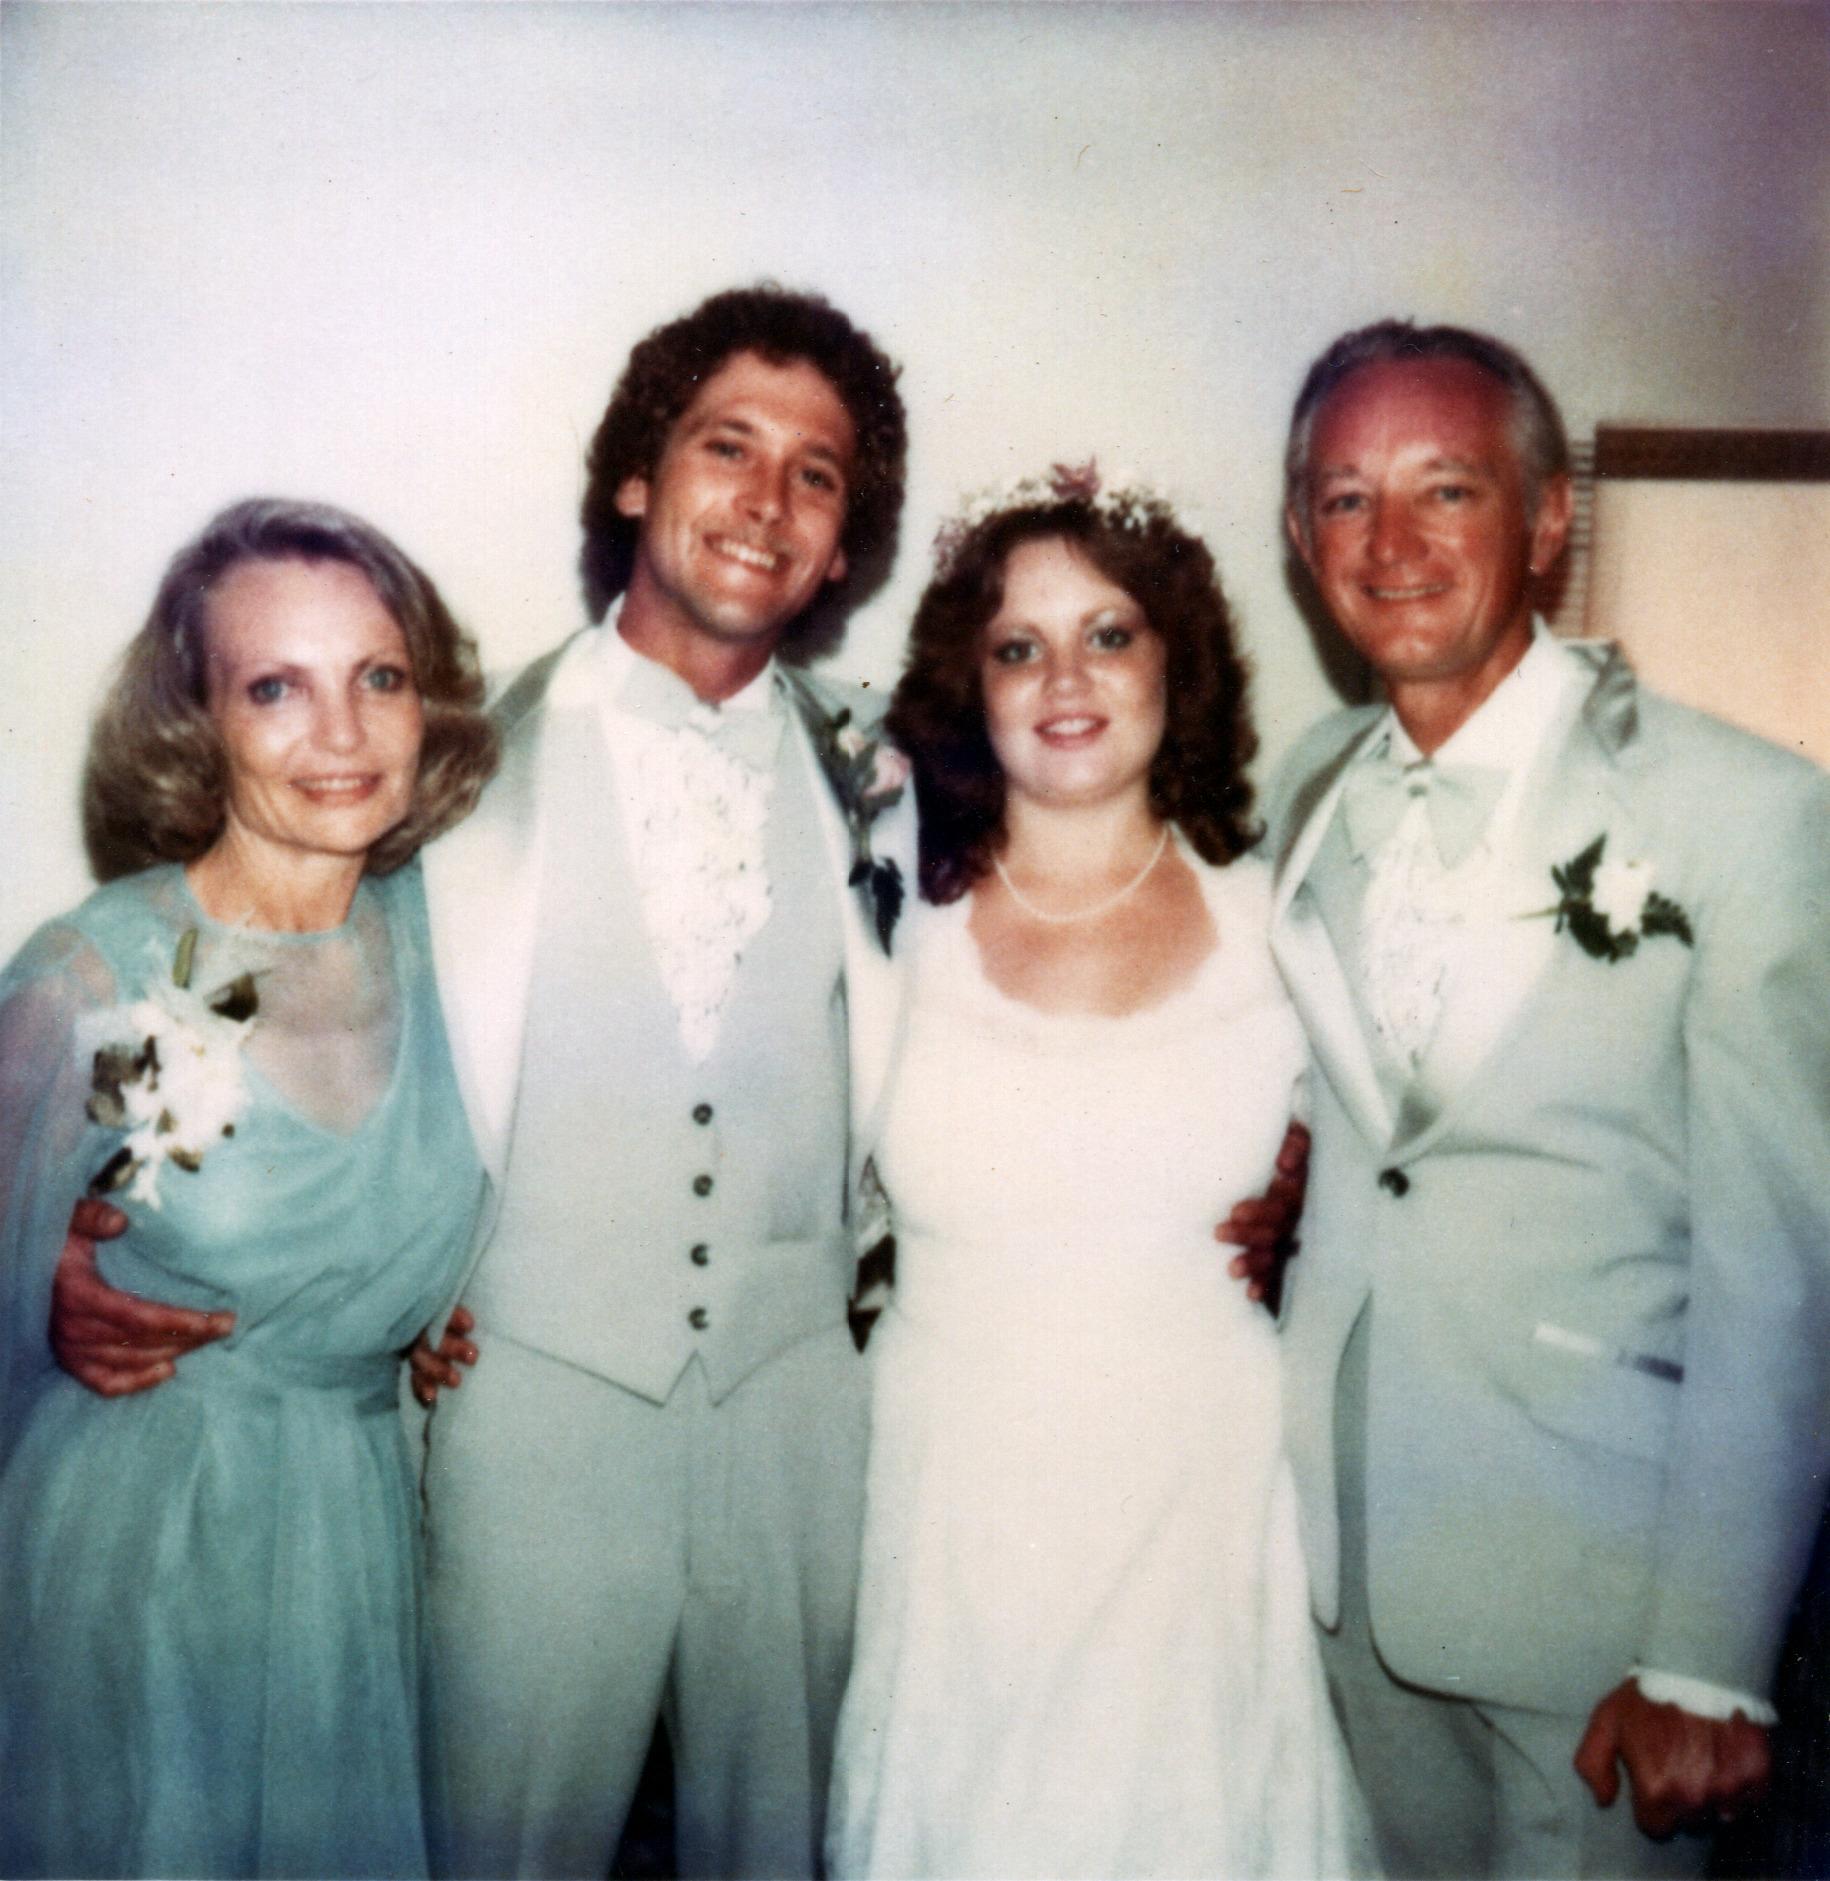 Mark, Mandy & Mandy's Parents